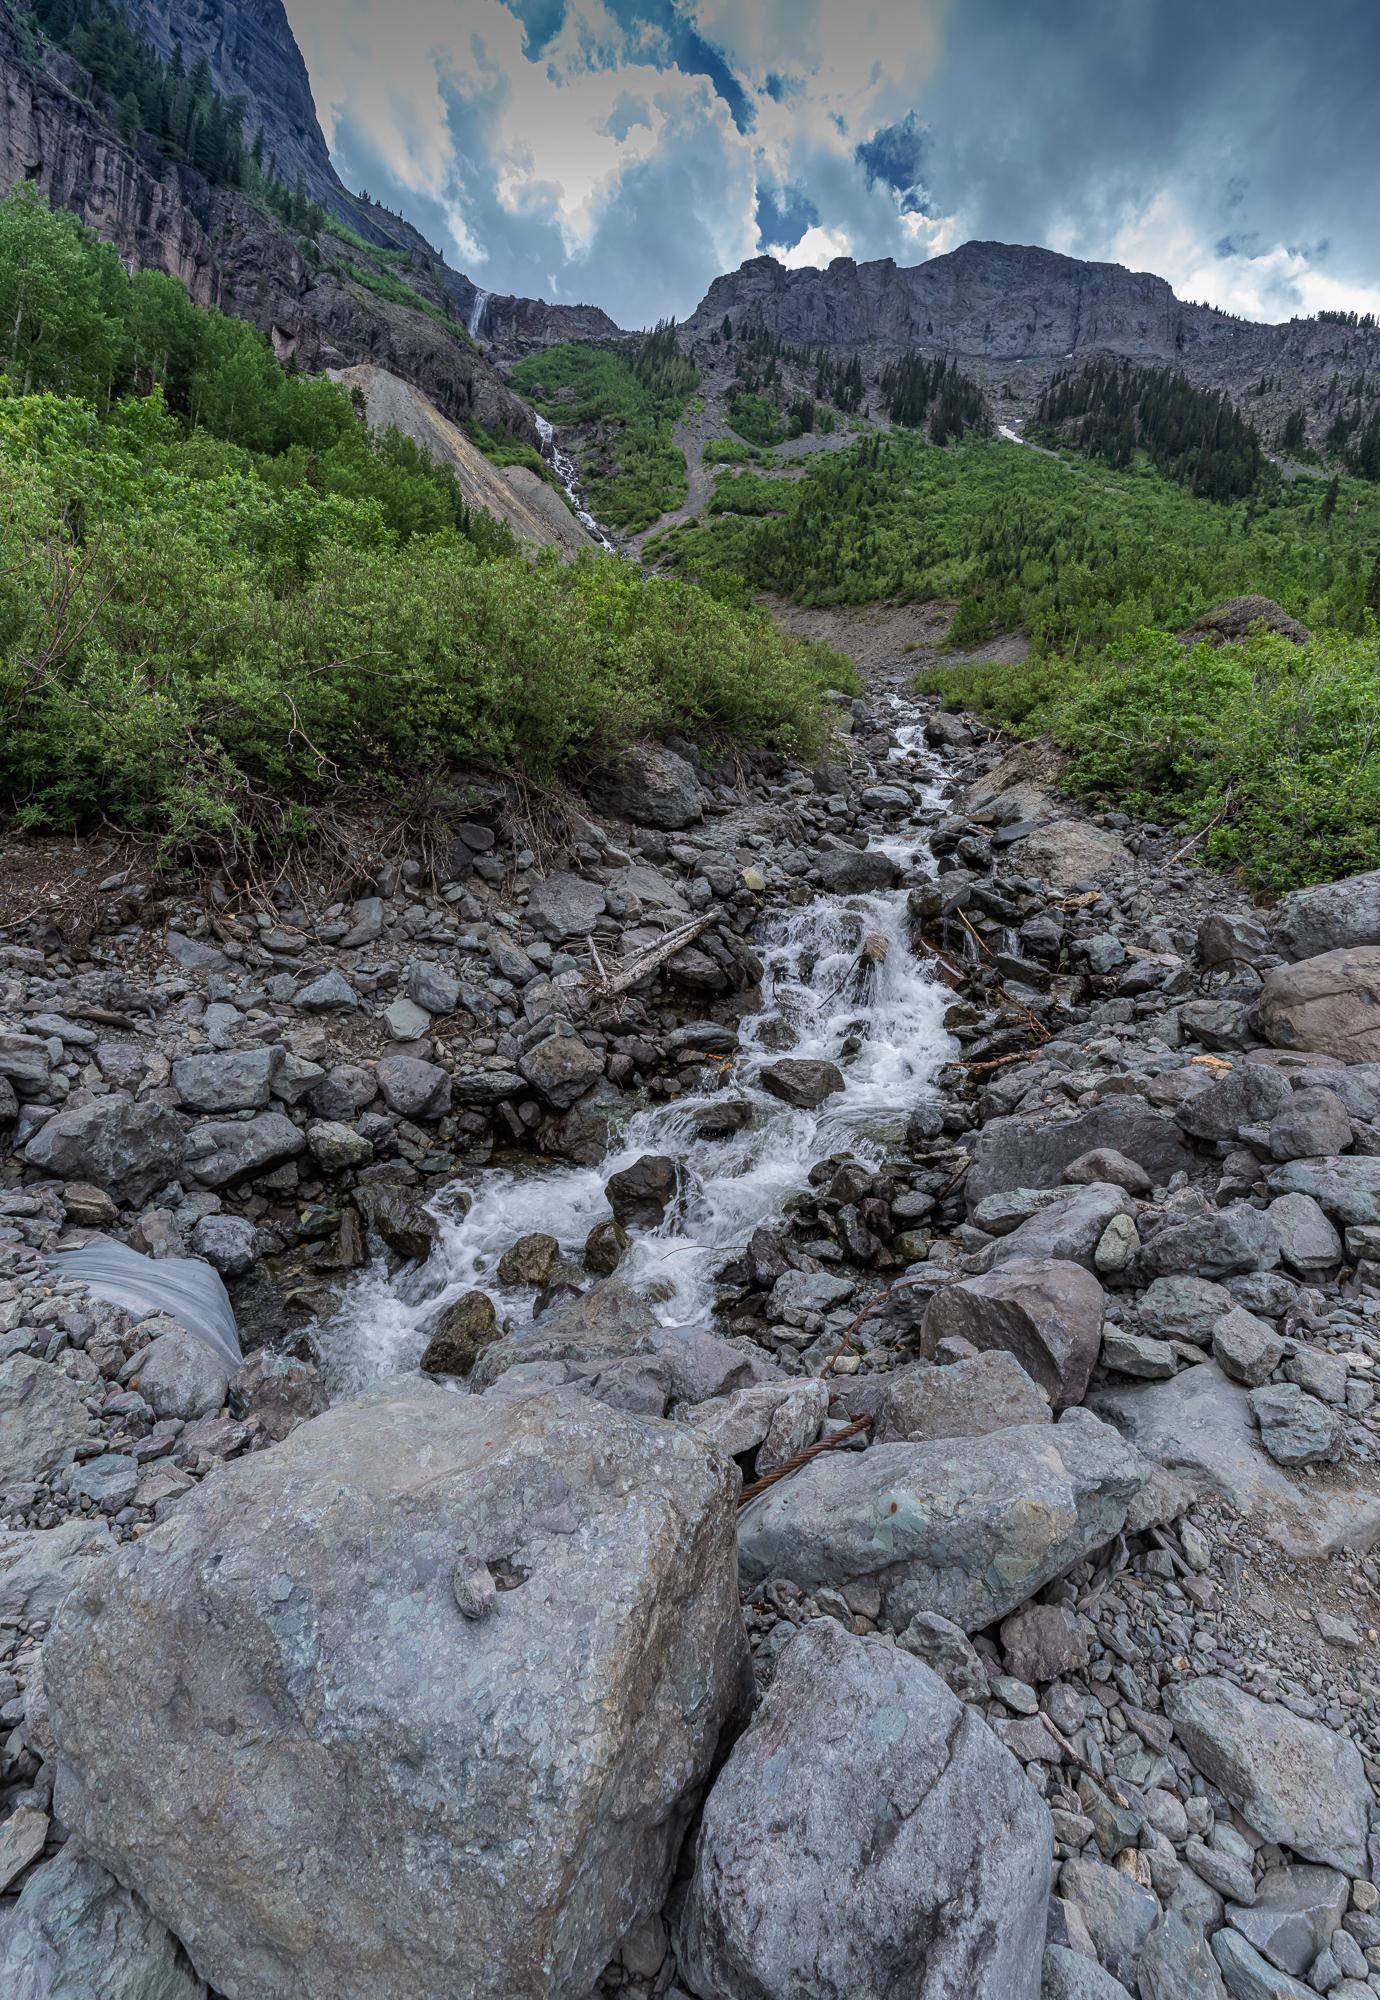 Ingram Falls & Creek, Telluride, CO